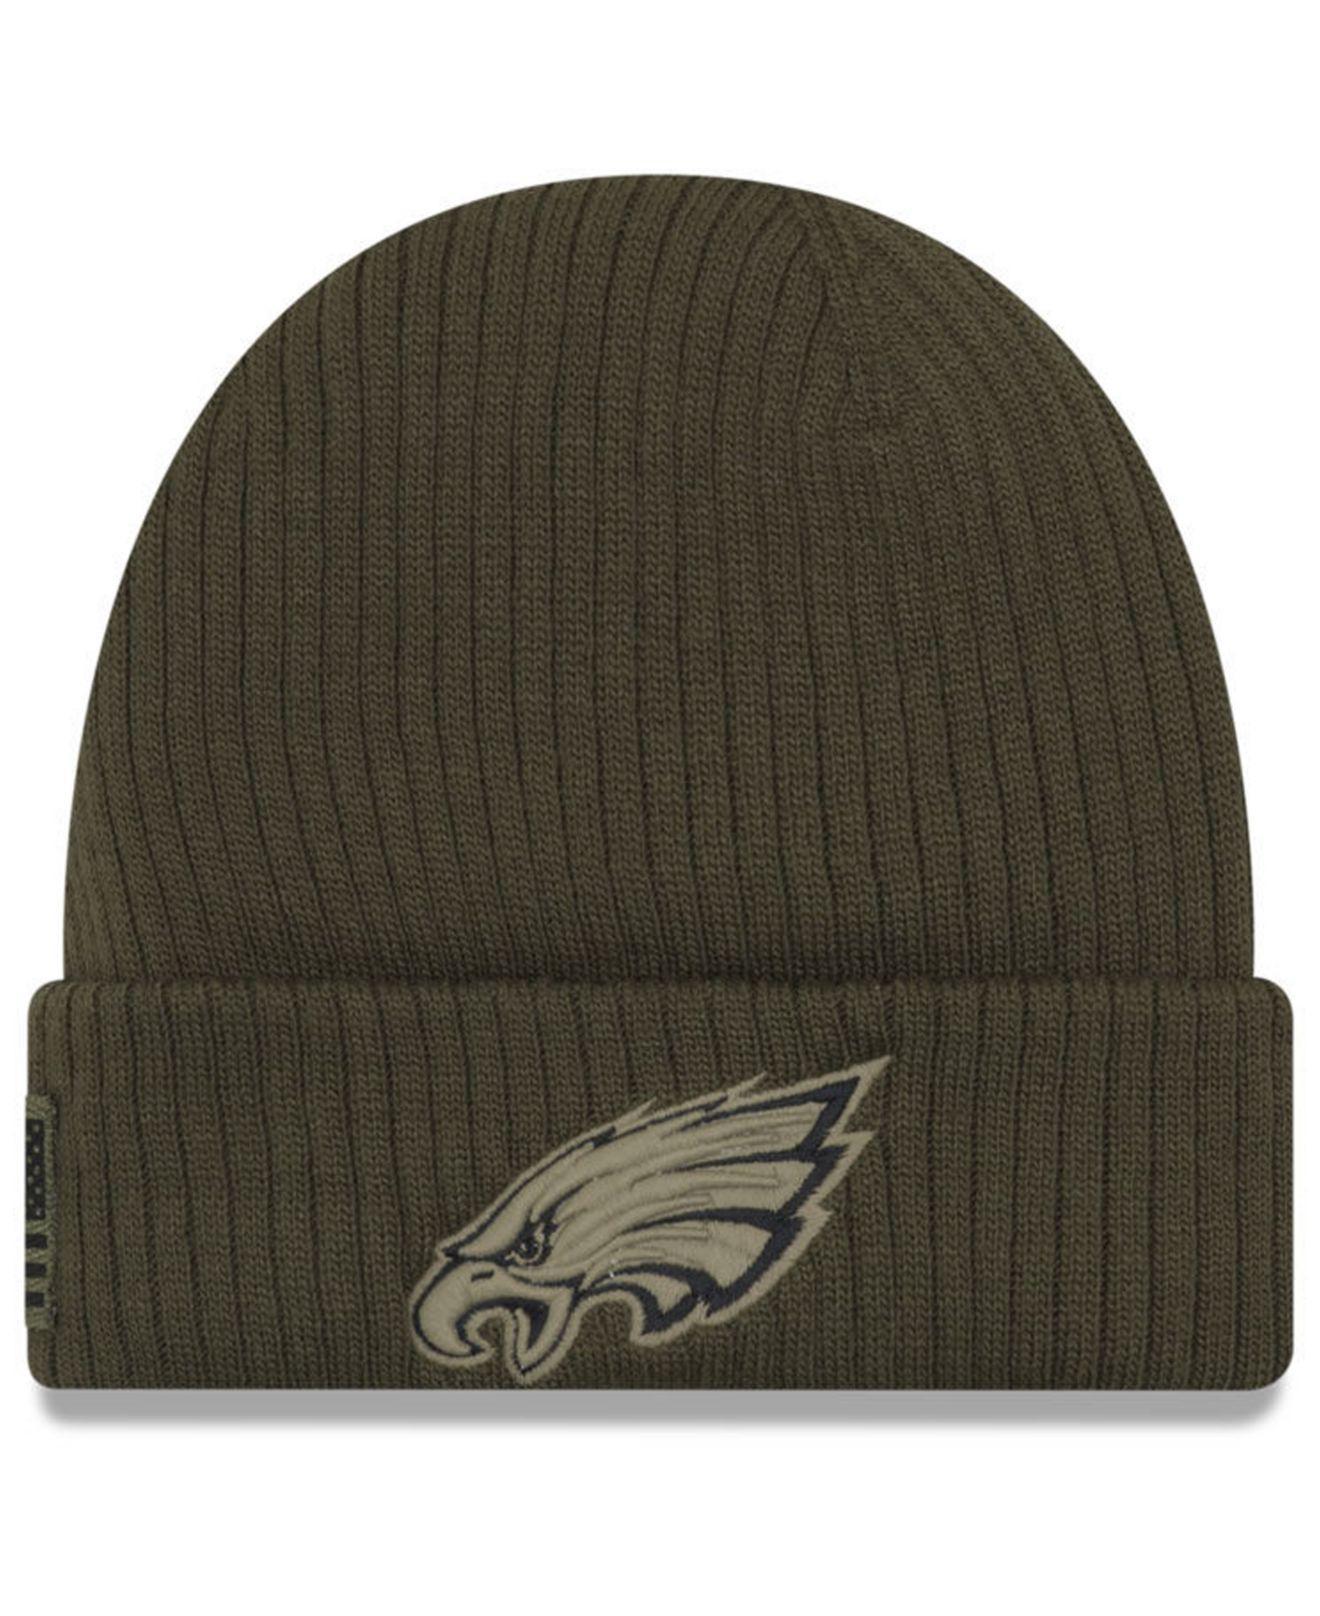 e1375381473 Lyst - Ktz Philadelphia Eagles Salute To Service Cuff Knit Hat in ...